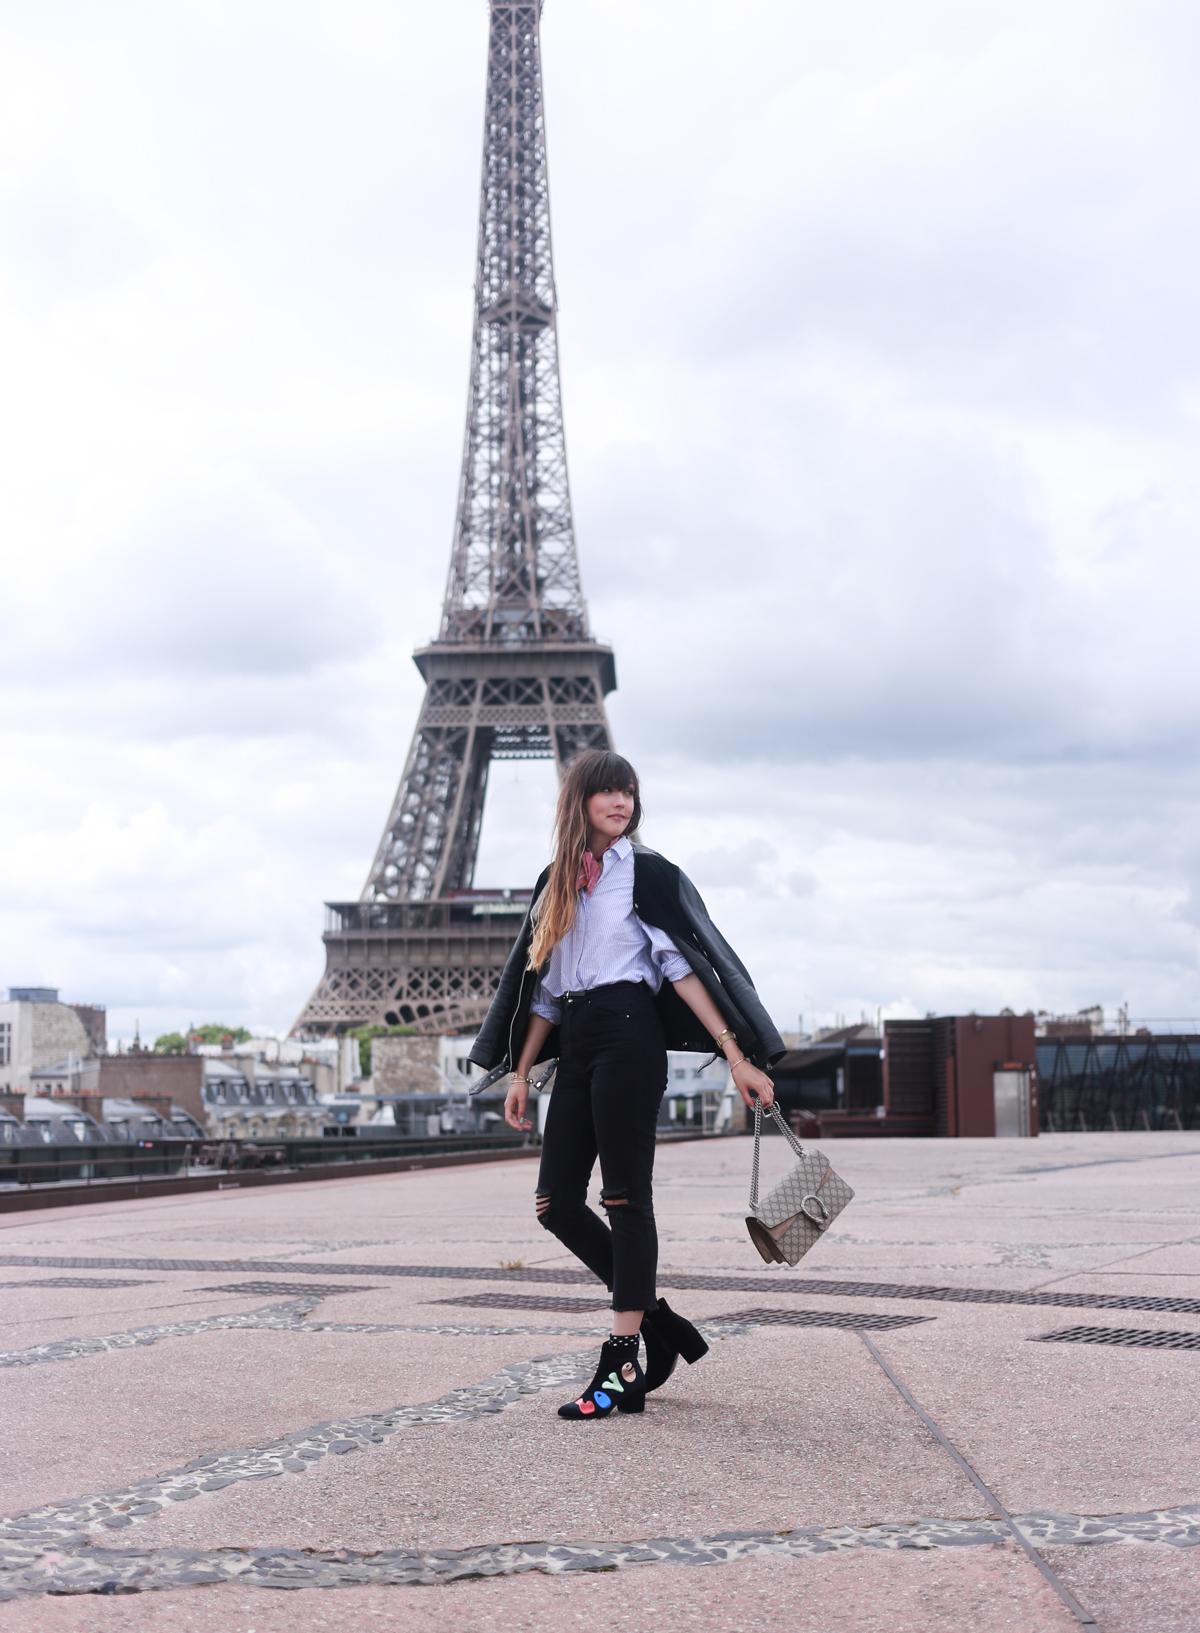 gucci-dionysus-bag-paris-givenchy-ds-blogger-collaboration-9